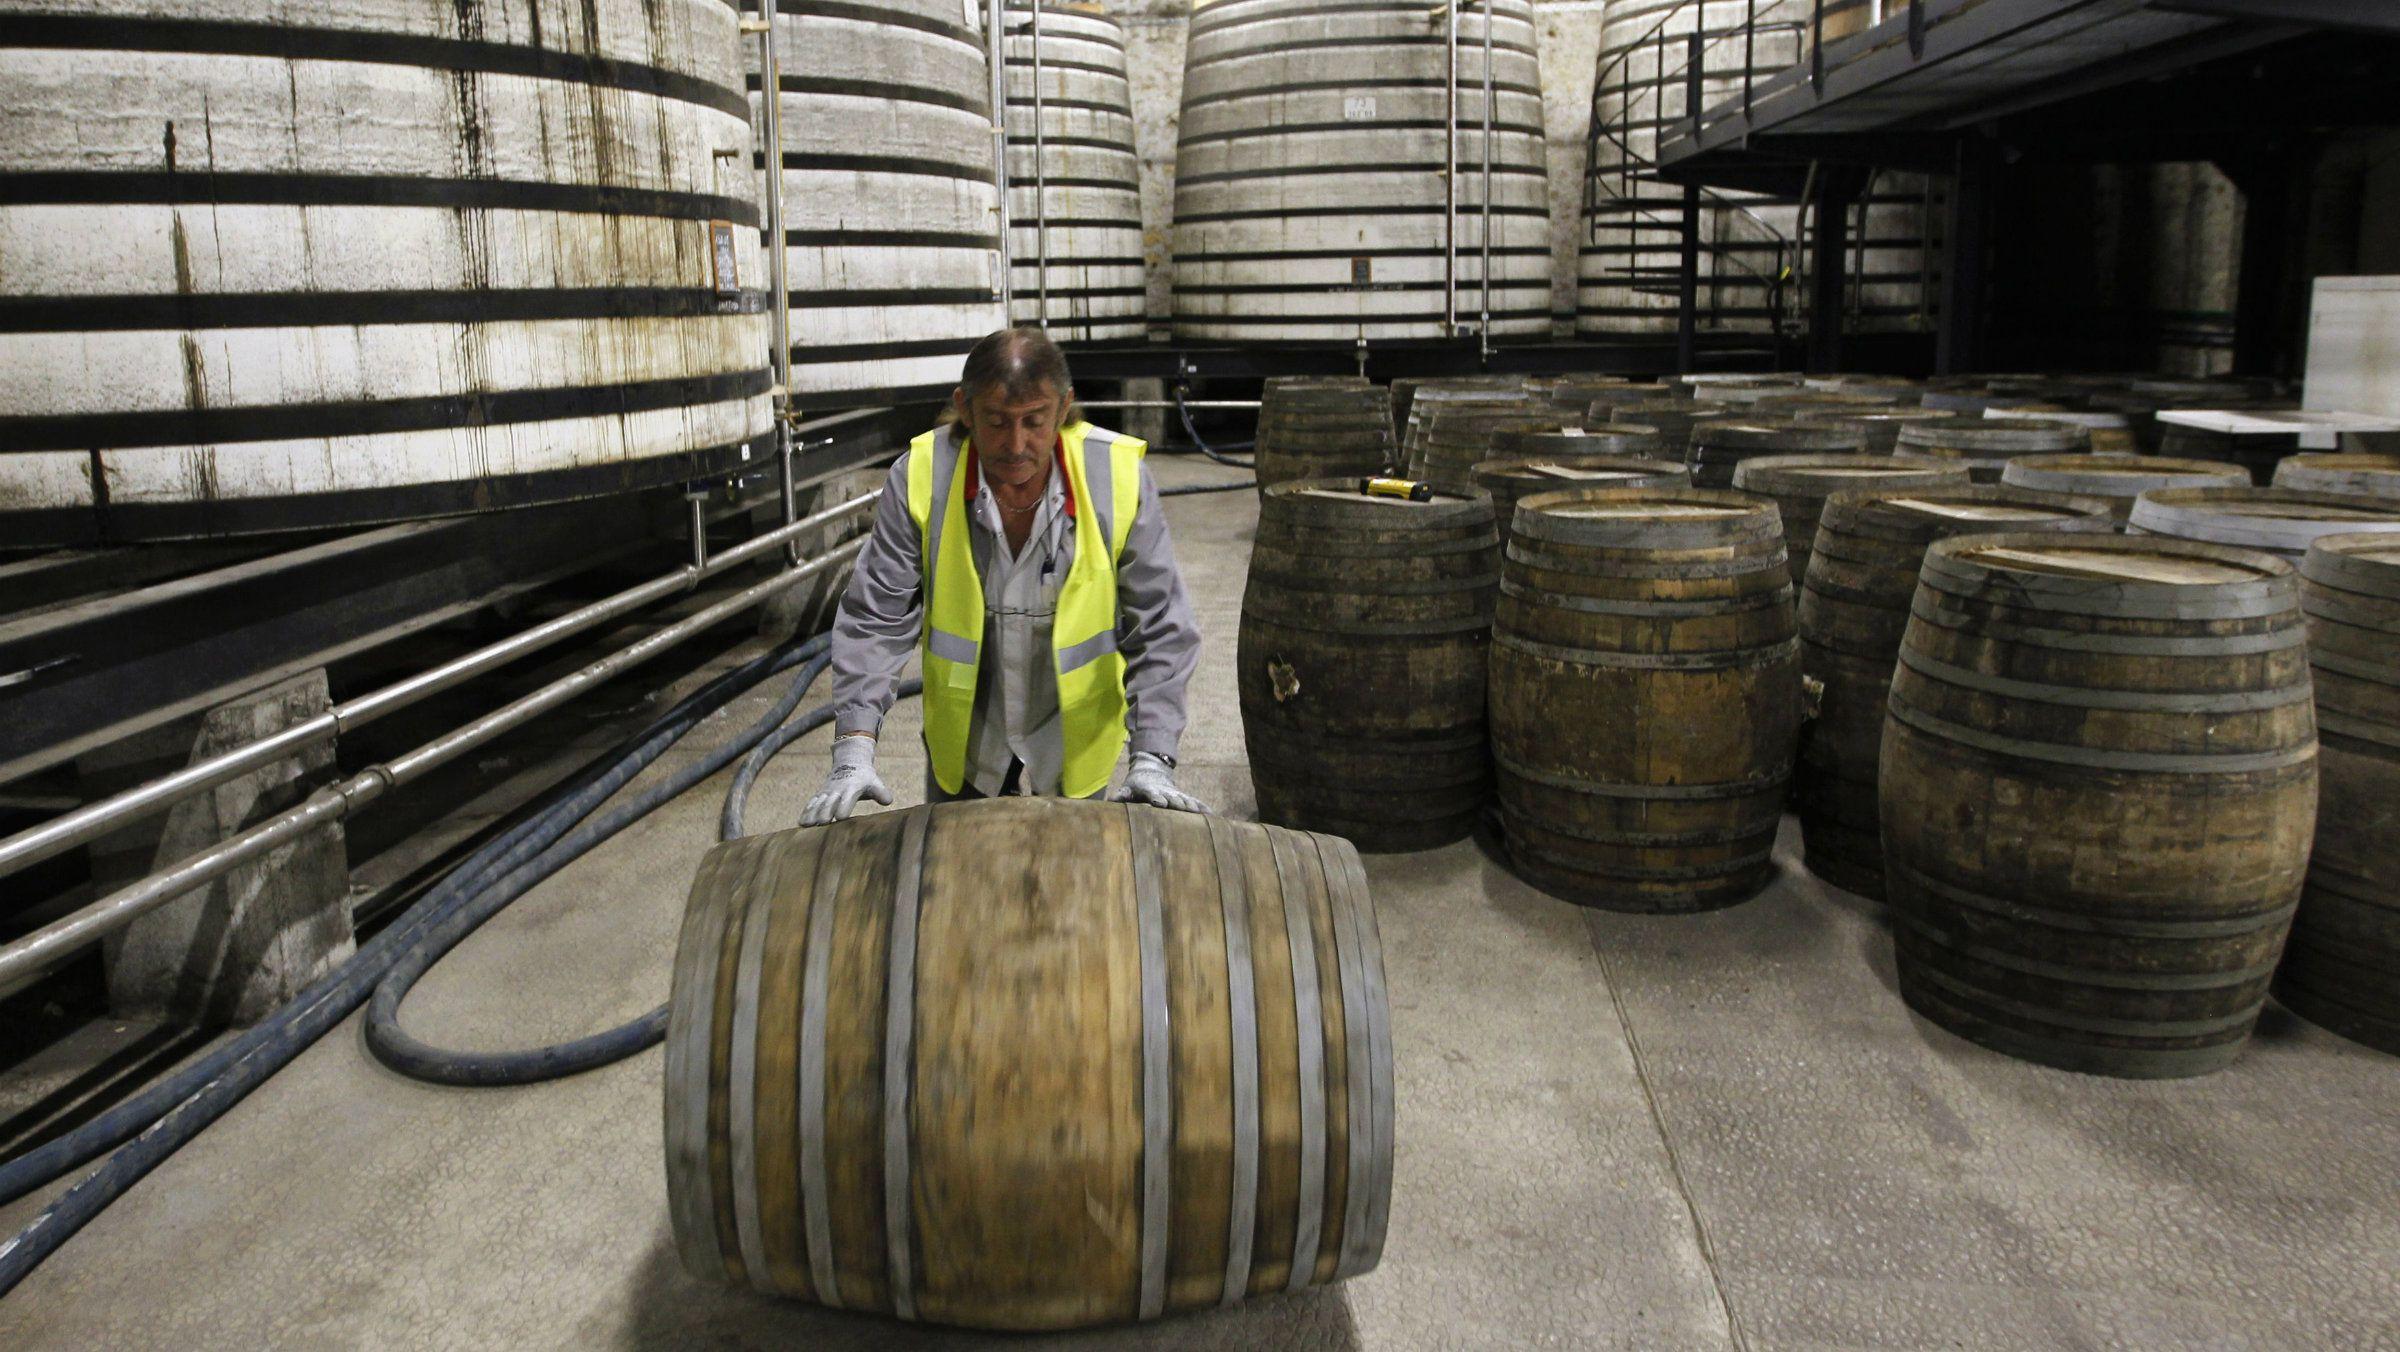 A technician rolls an oak barrel in a cellar where cognac is aged at the Remy Martin distillery in Cognac, southwestern France.